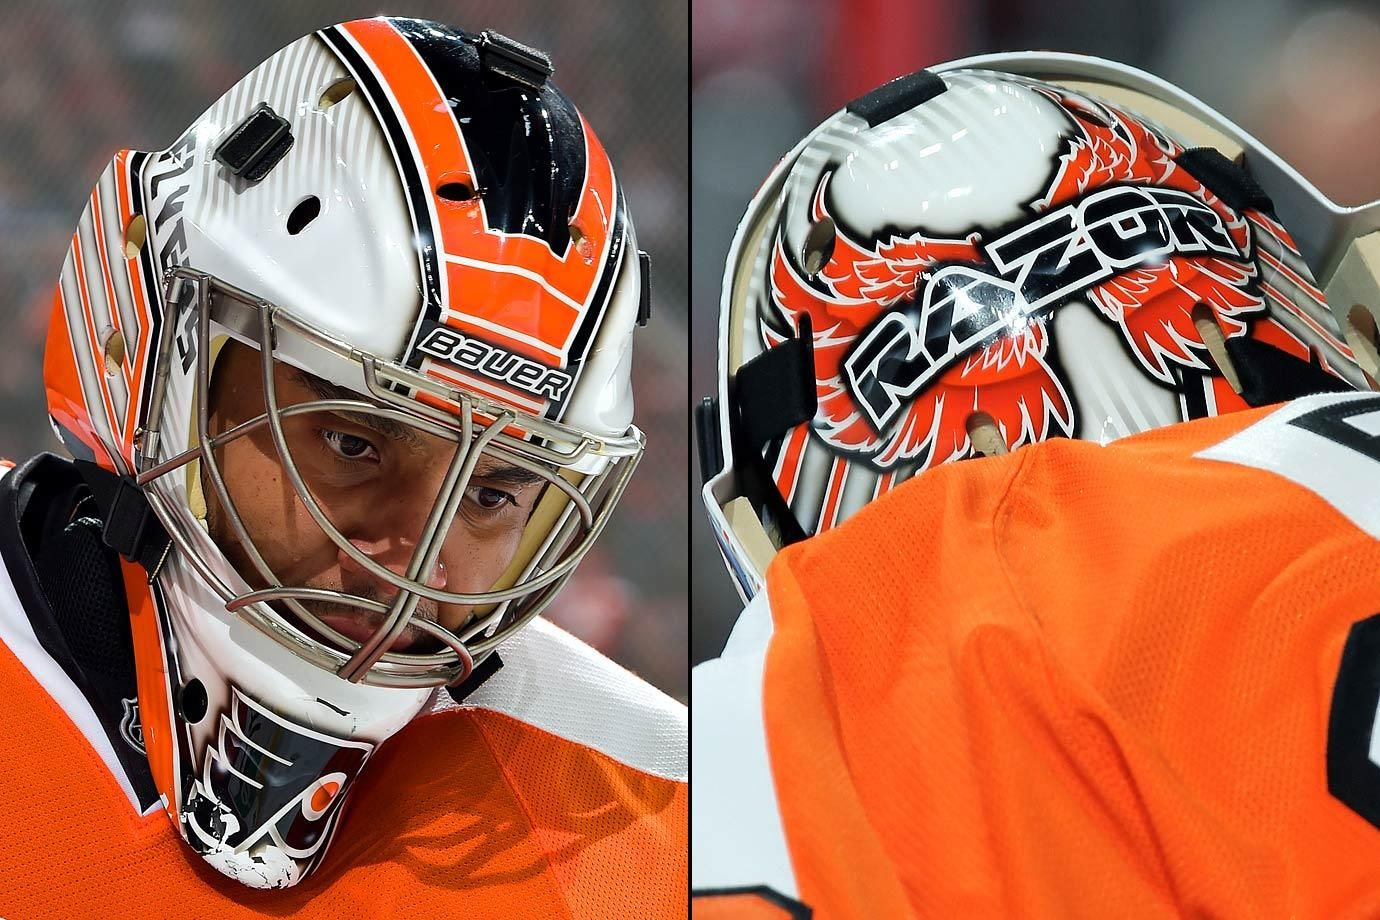 NHL Goalie Masks by Team (2016) Goalie mask, Goalie, Nhl